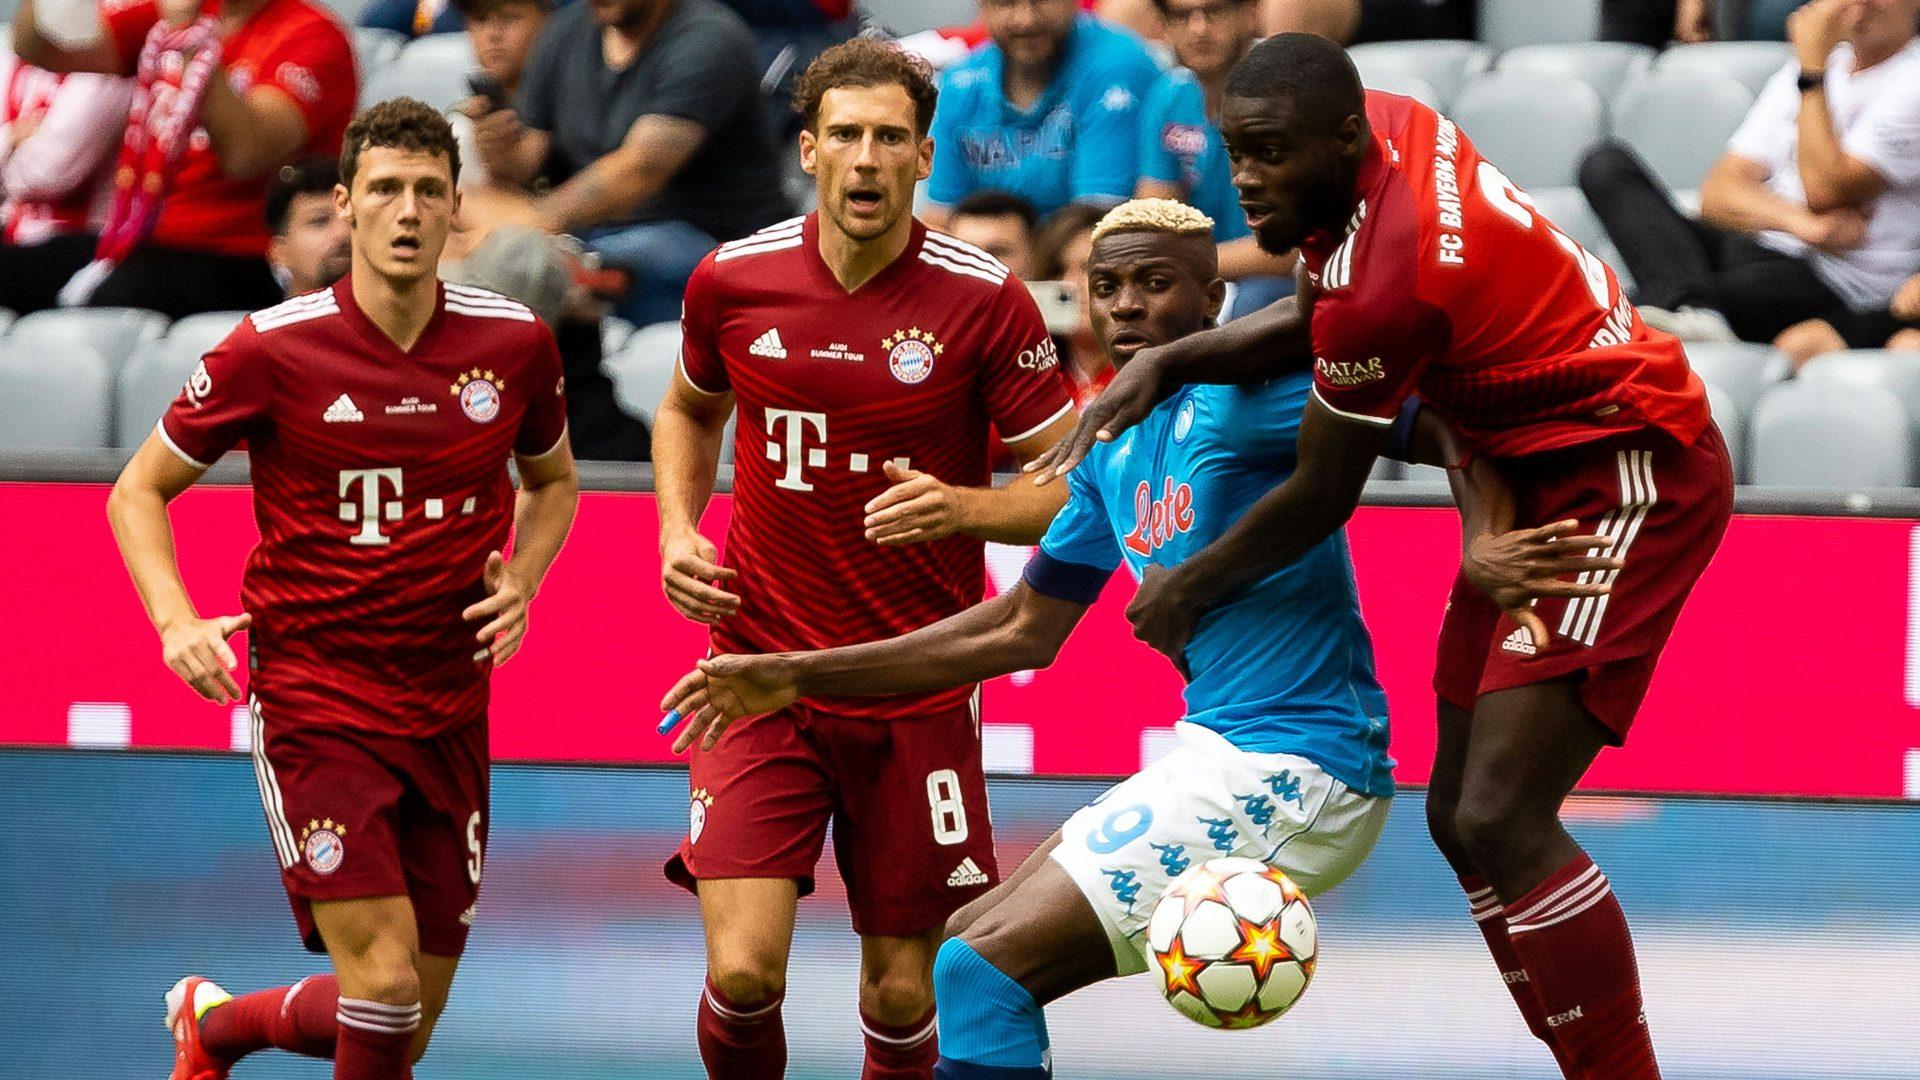 Bundesliga Bayern Munich 0 3 Napoli As It Happened